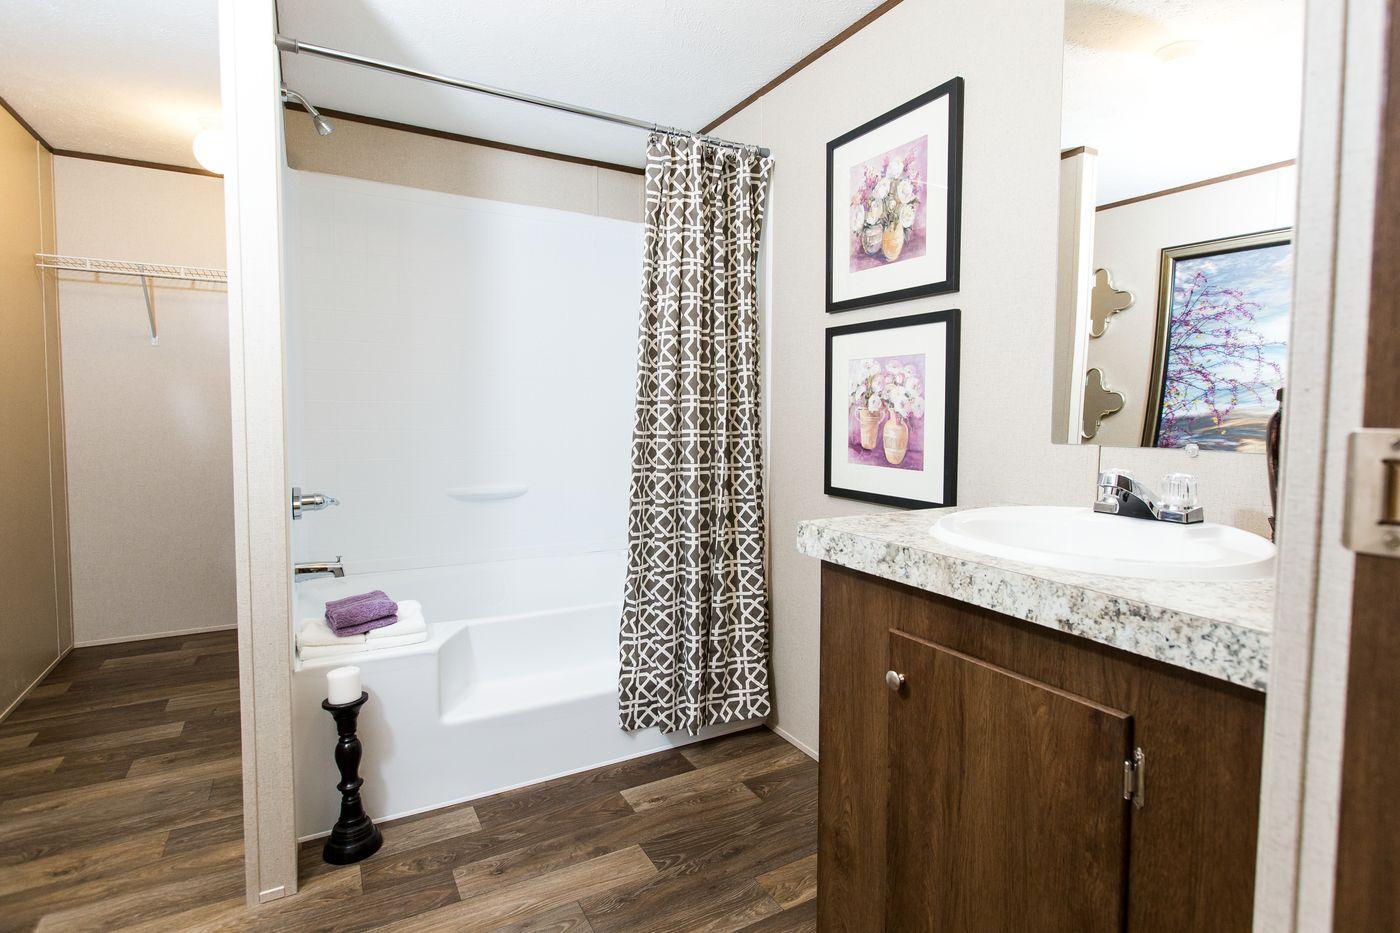 The Satisfaction Bathroom